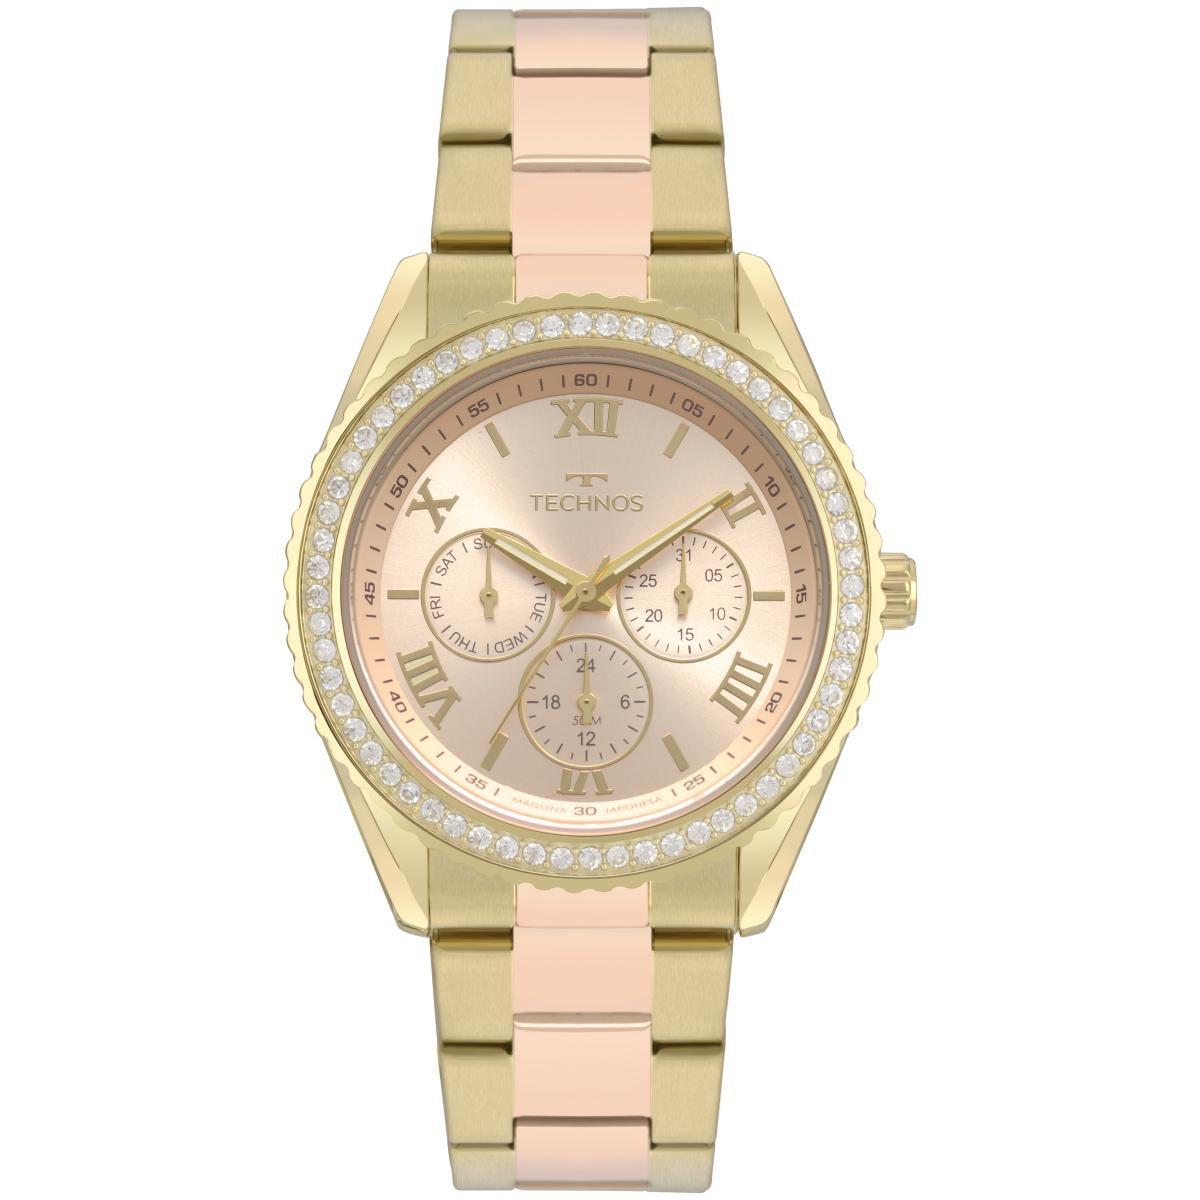 Relógio Feminino Technos Elegance Ladies 6P29AKG/5T 42mm Aço Dourado/Rosé